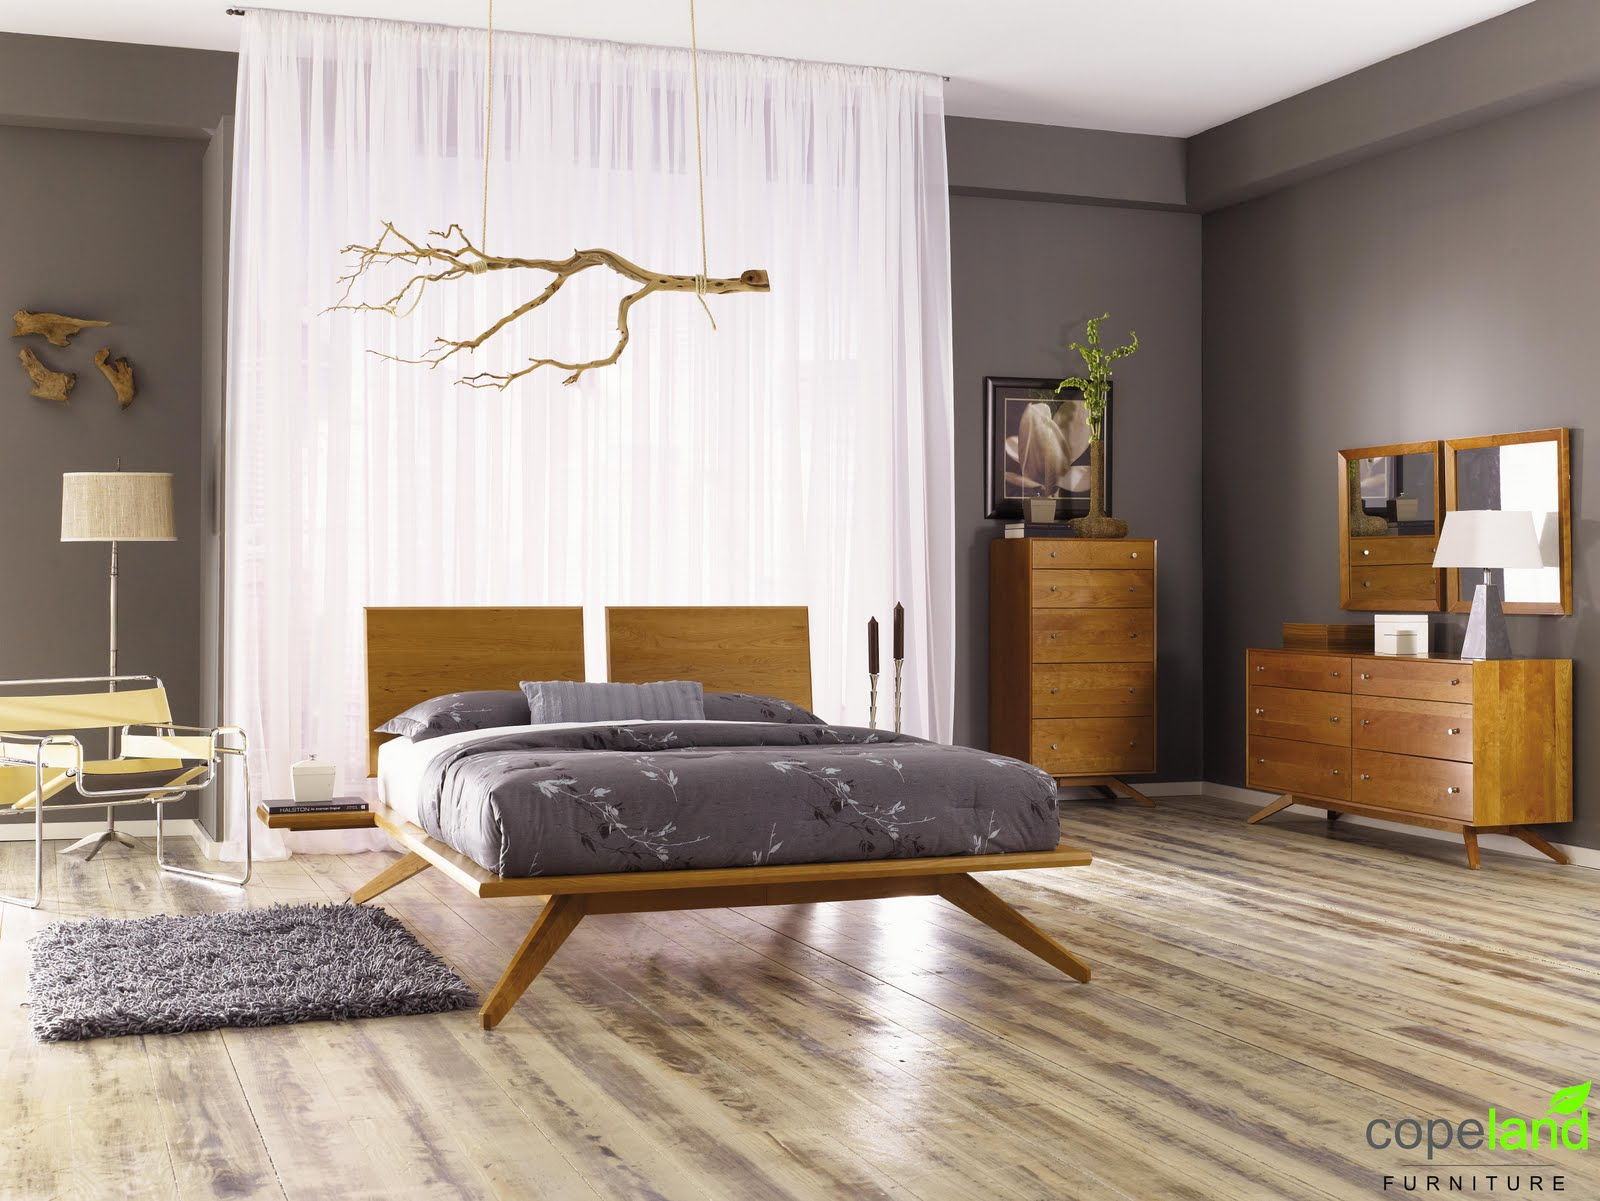 Danish Furniture Of Colorado Copeland Furniture